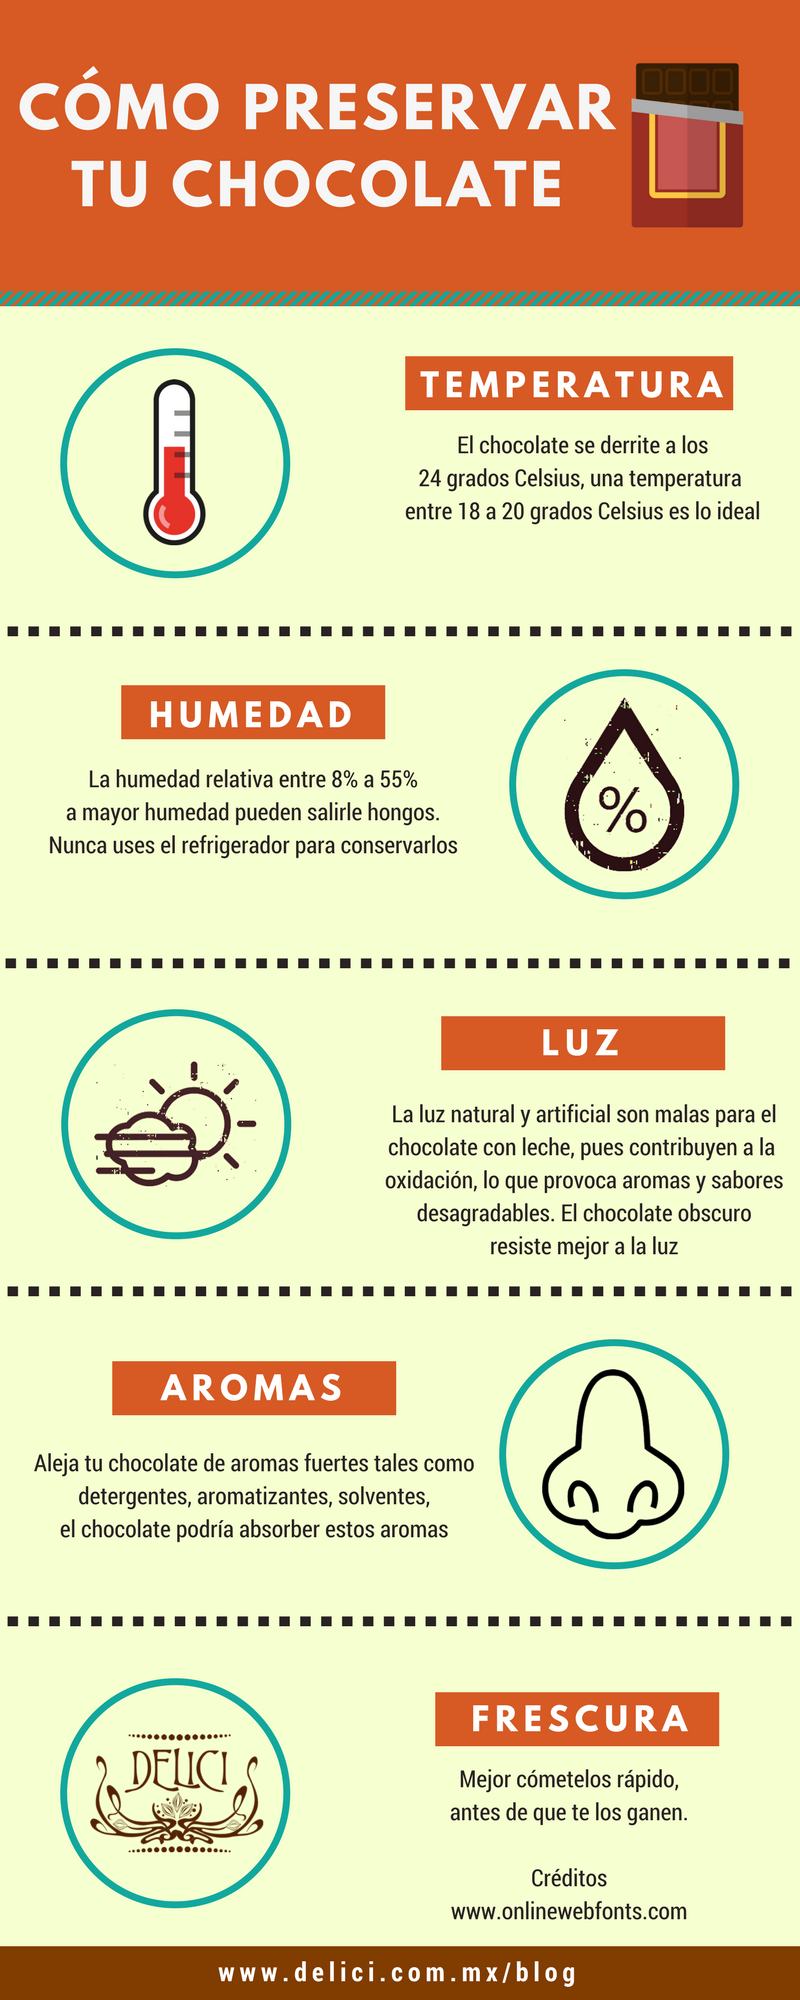 Infografía de como preservar tu chocolates